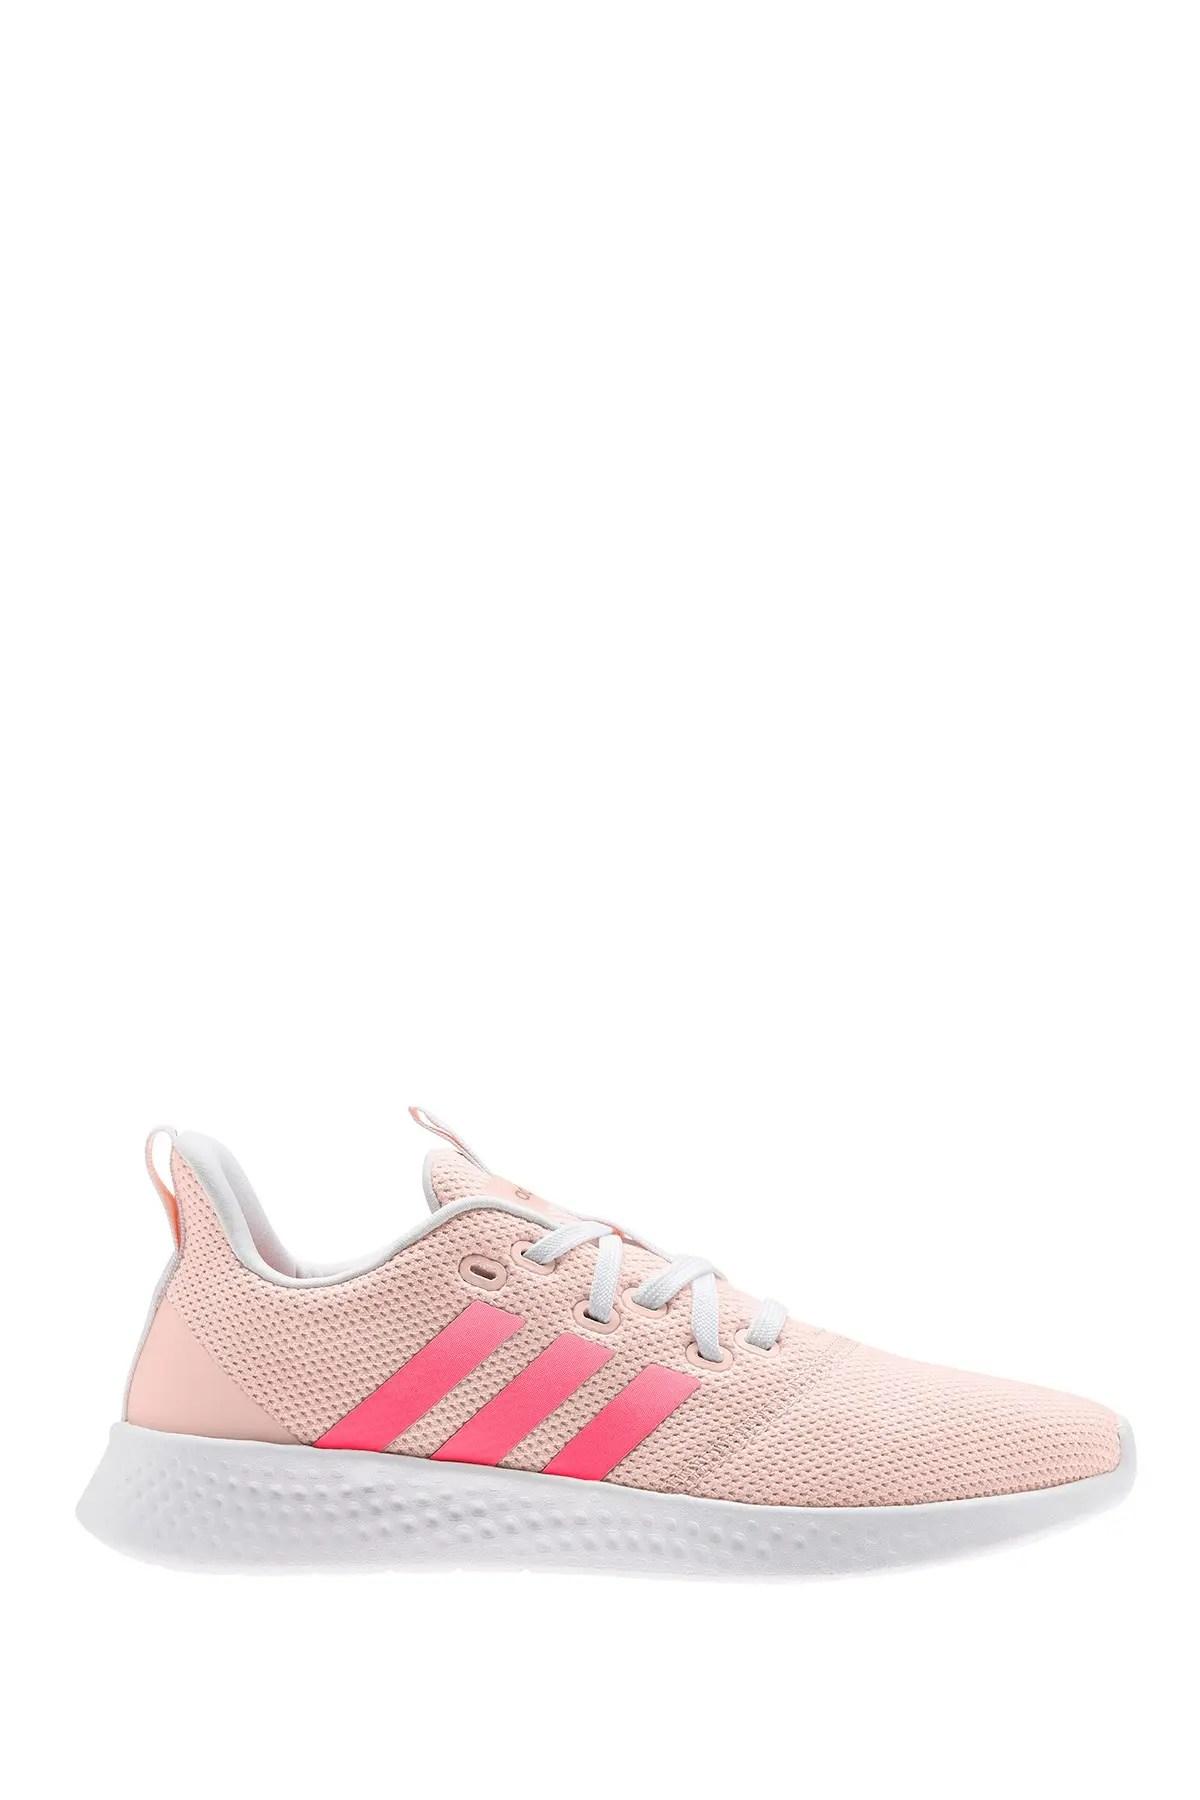 puremotion running shoe